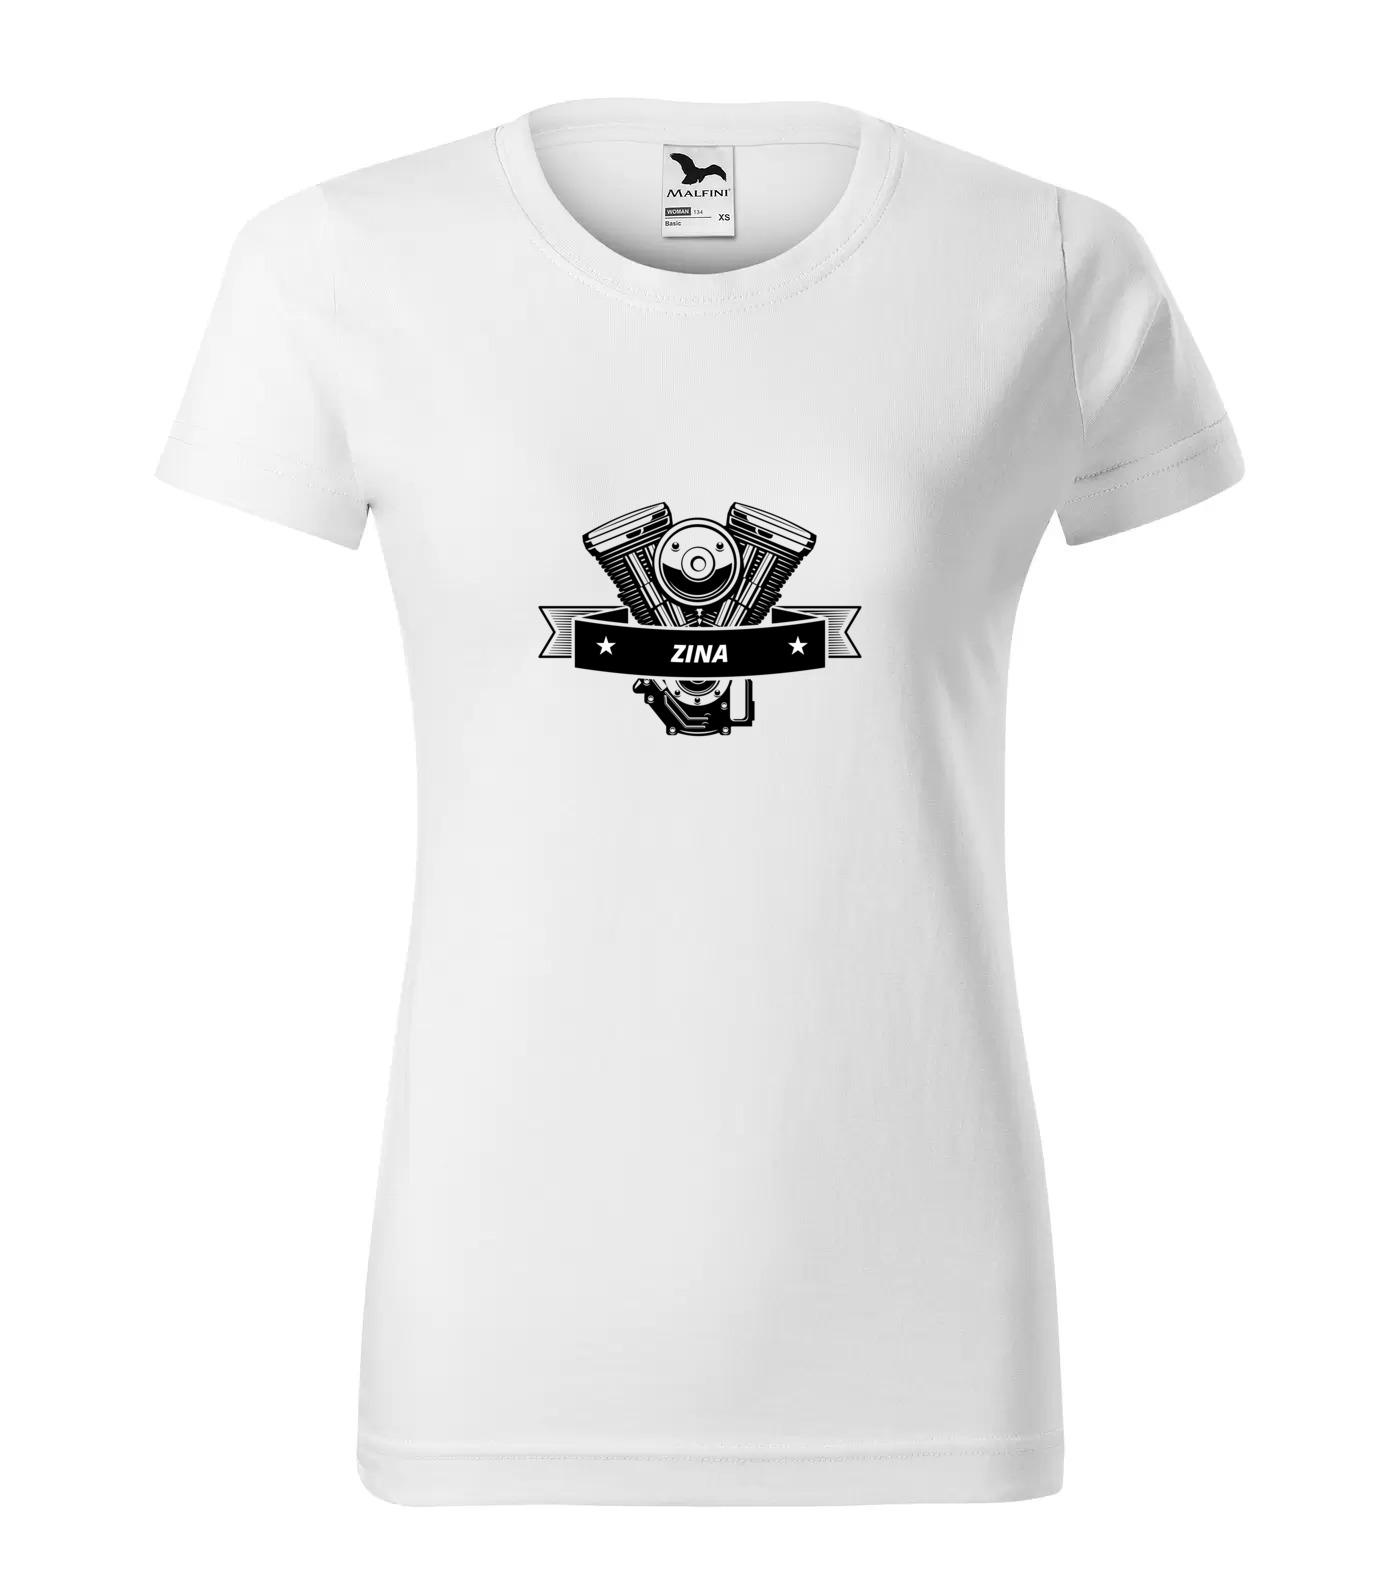 Tričko Motorkářka Zina